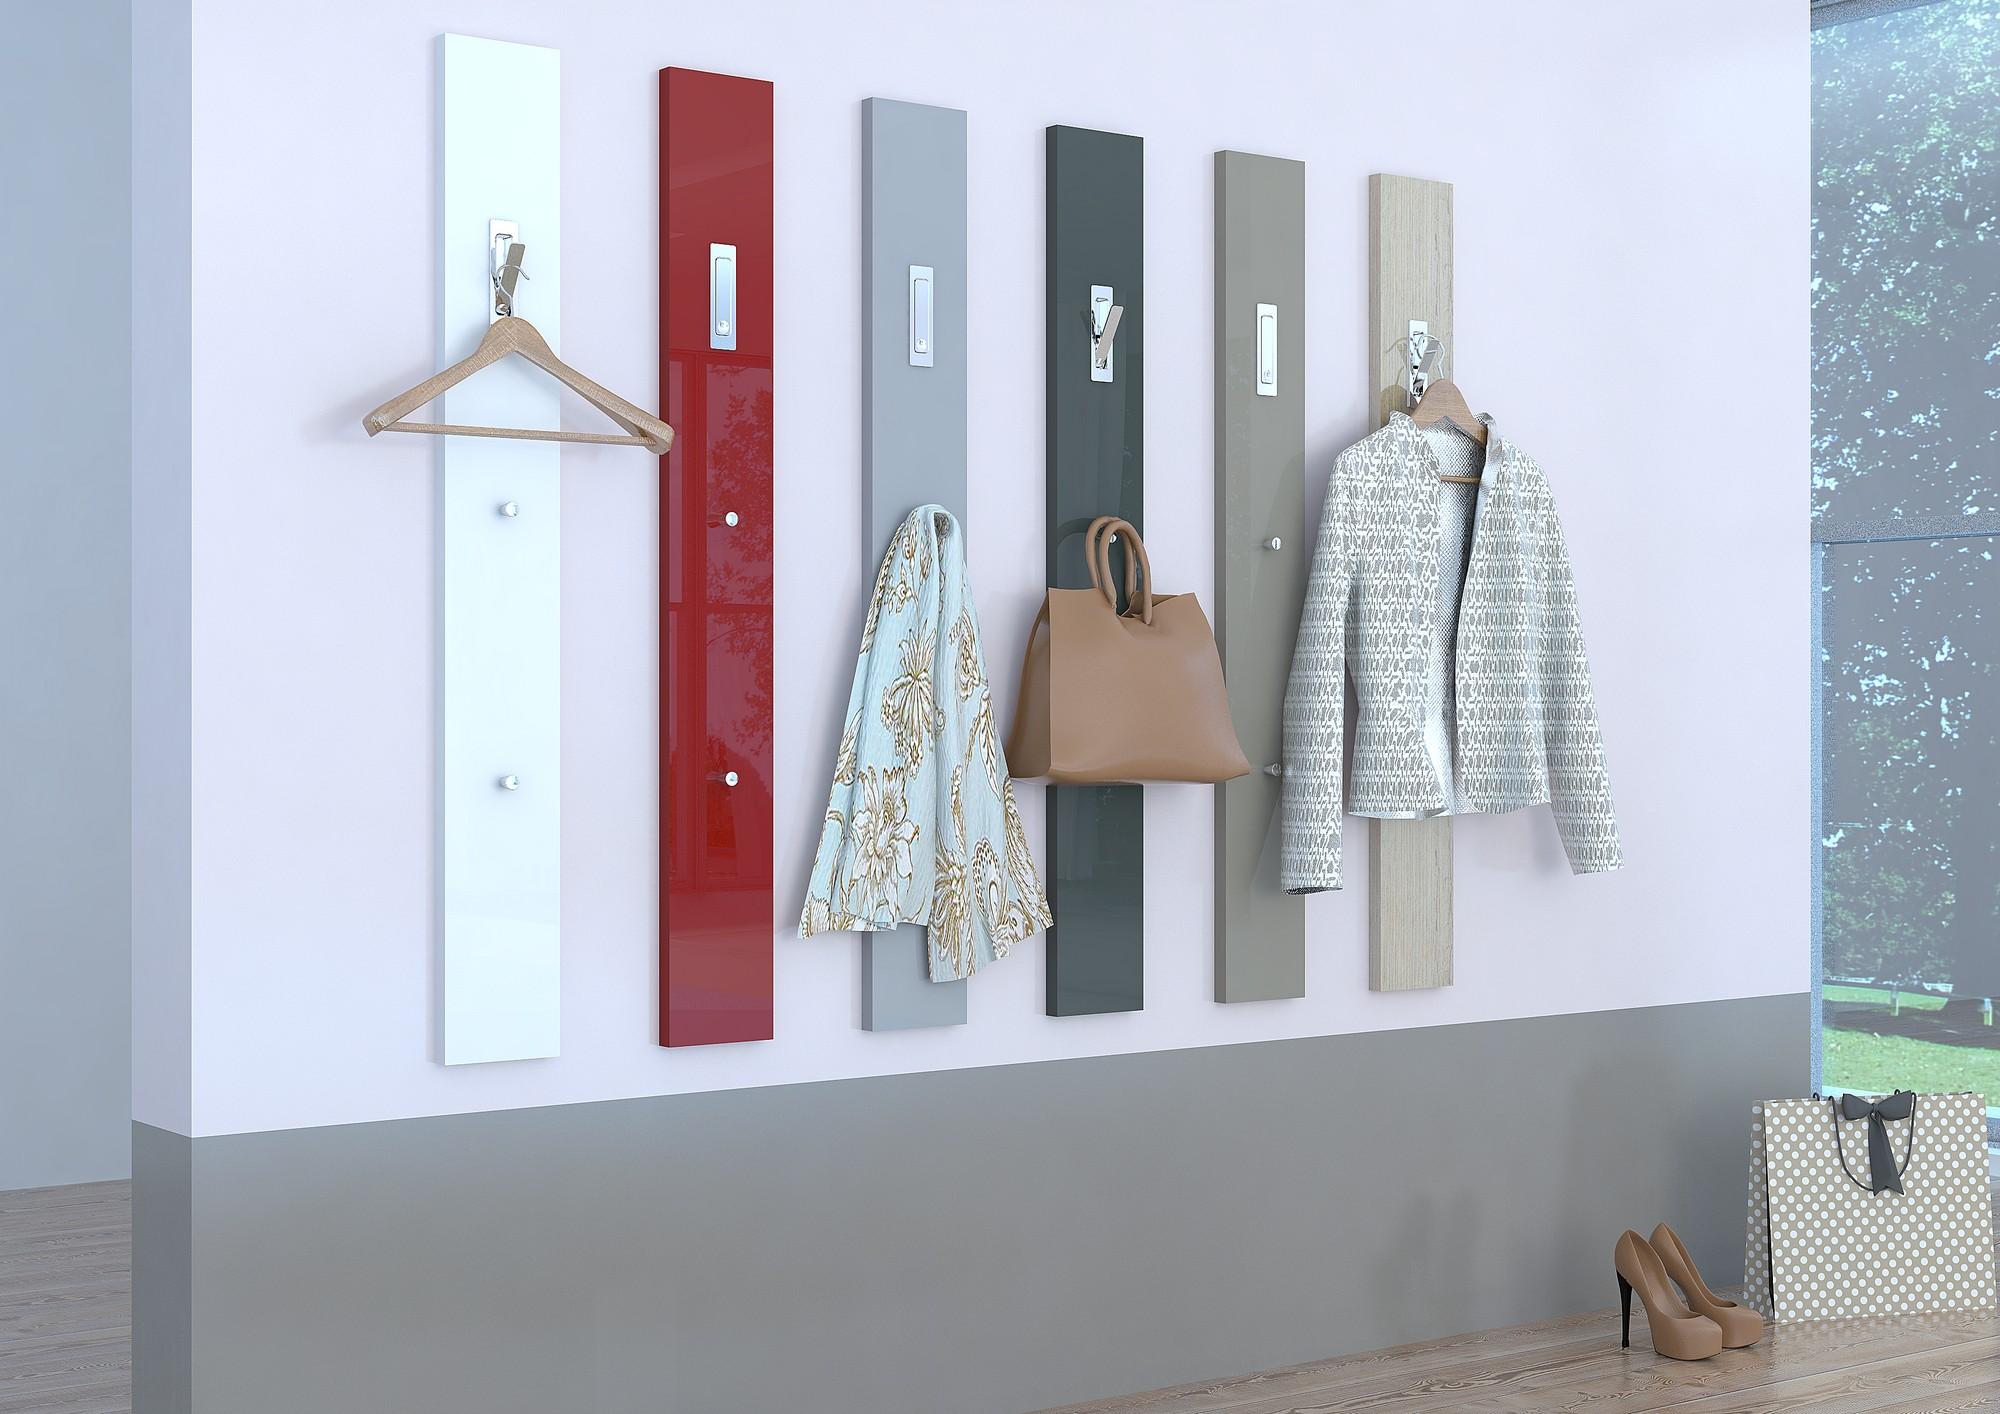 21480470 clothes hanger tecnos italy. Black Bedroom Furniture Sets. Home Design Ideas